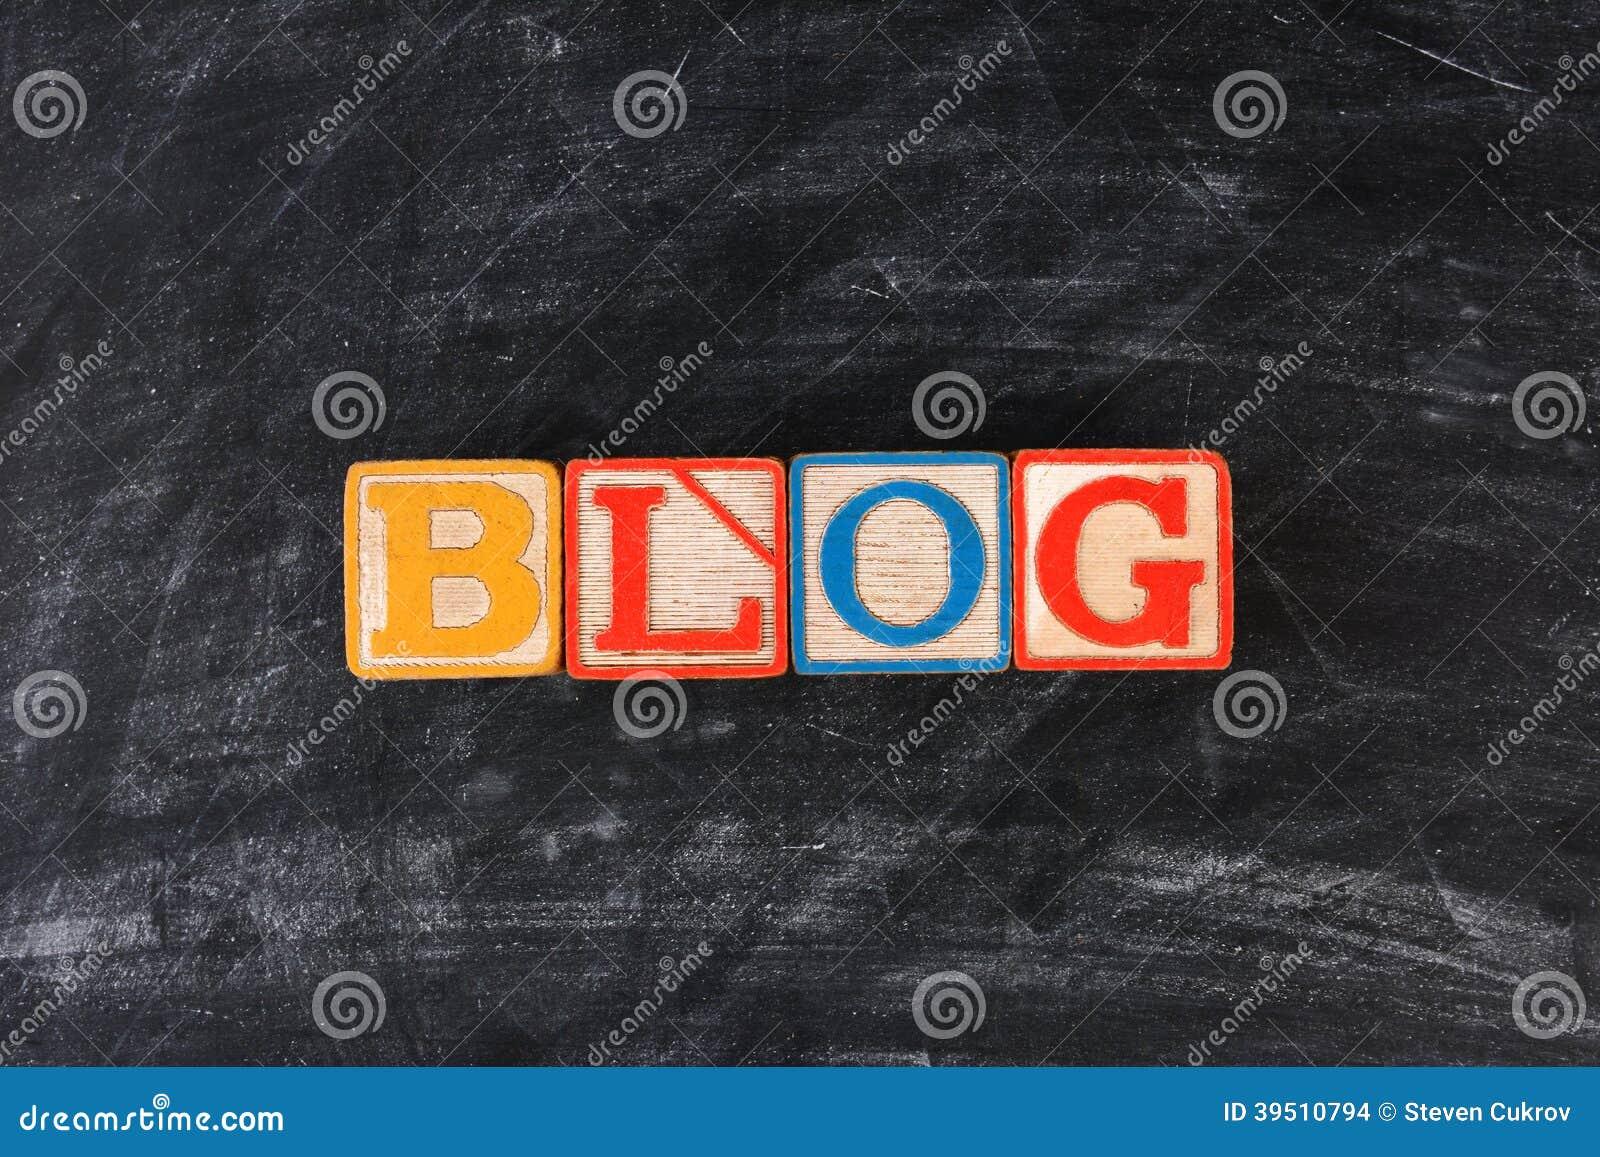 Blocks Spelling Out Blog